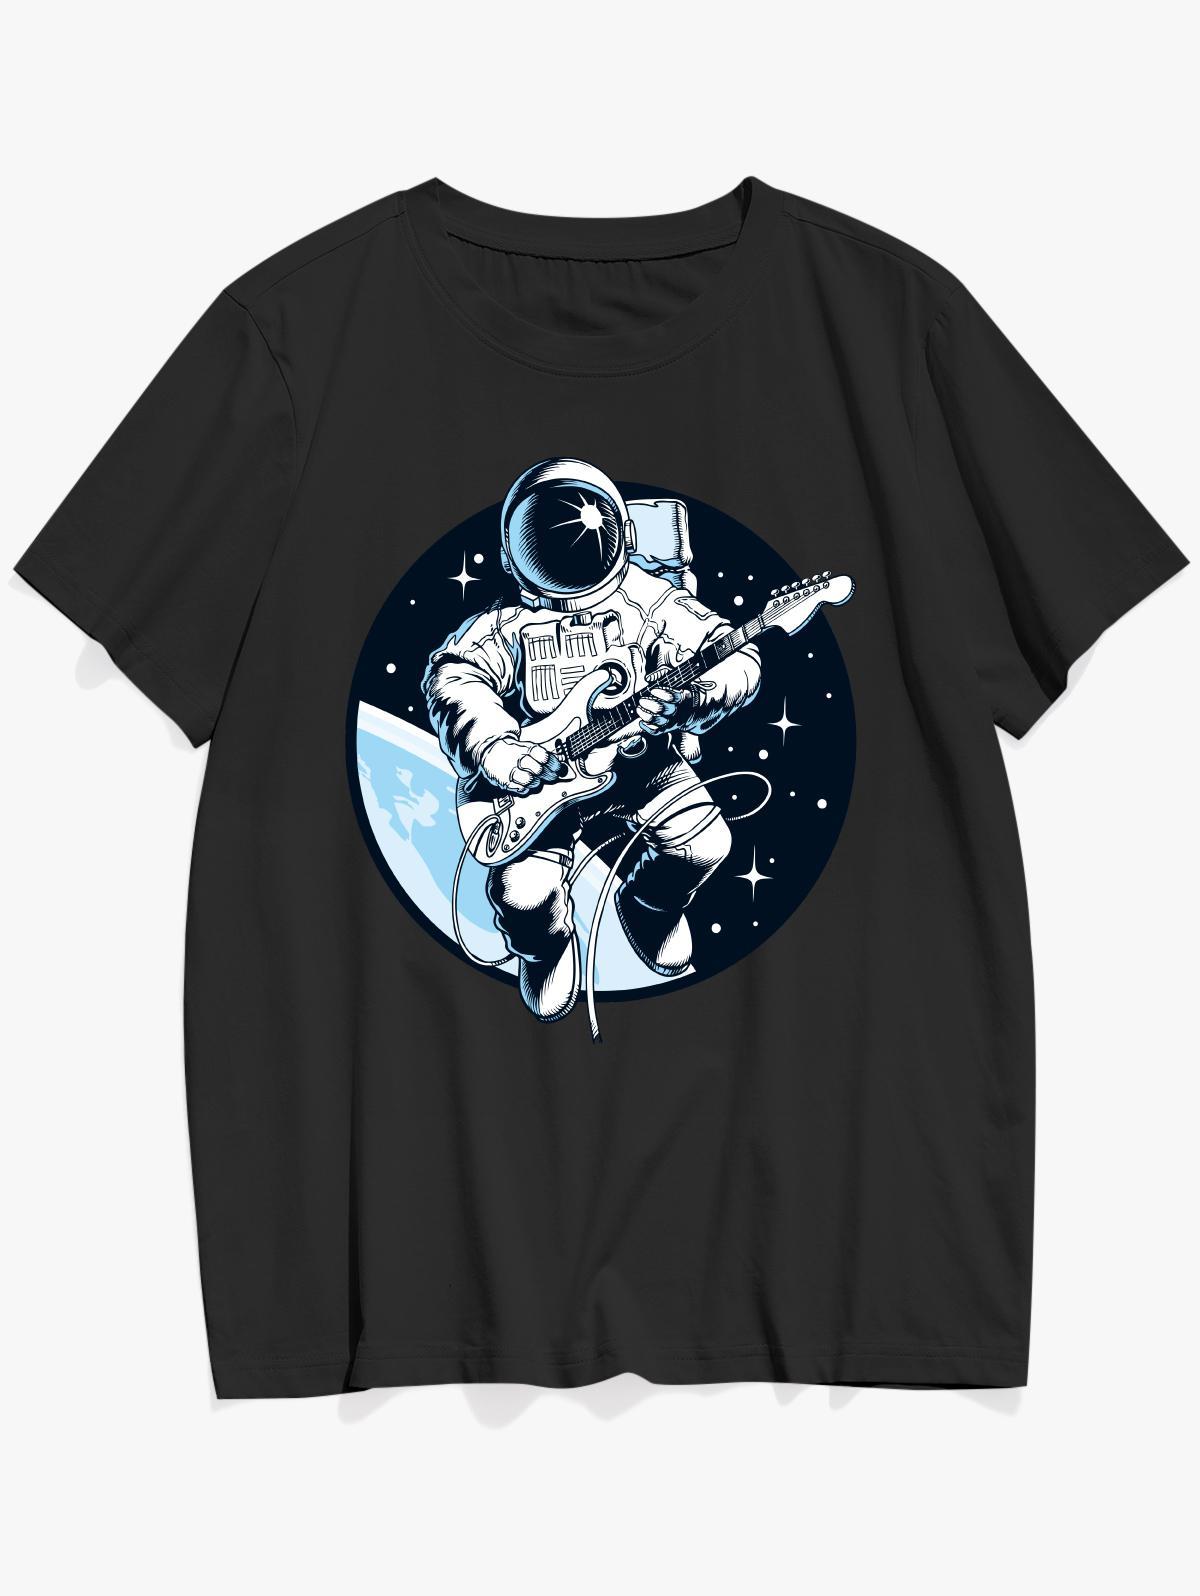 Playing Guitar Astronaut Print Graphic Tee, Black